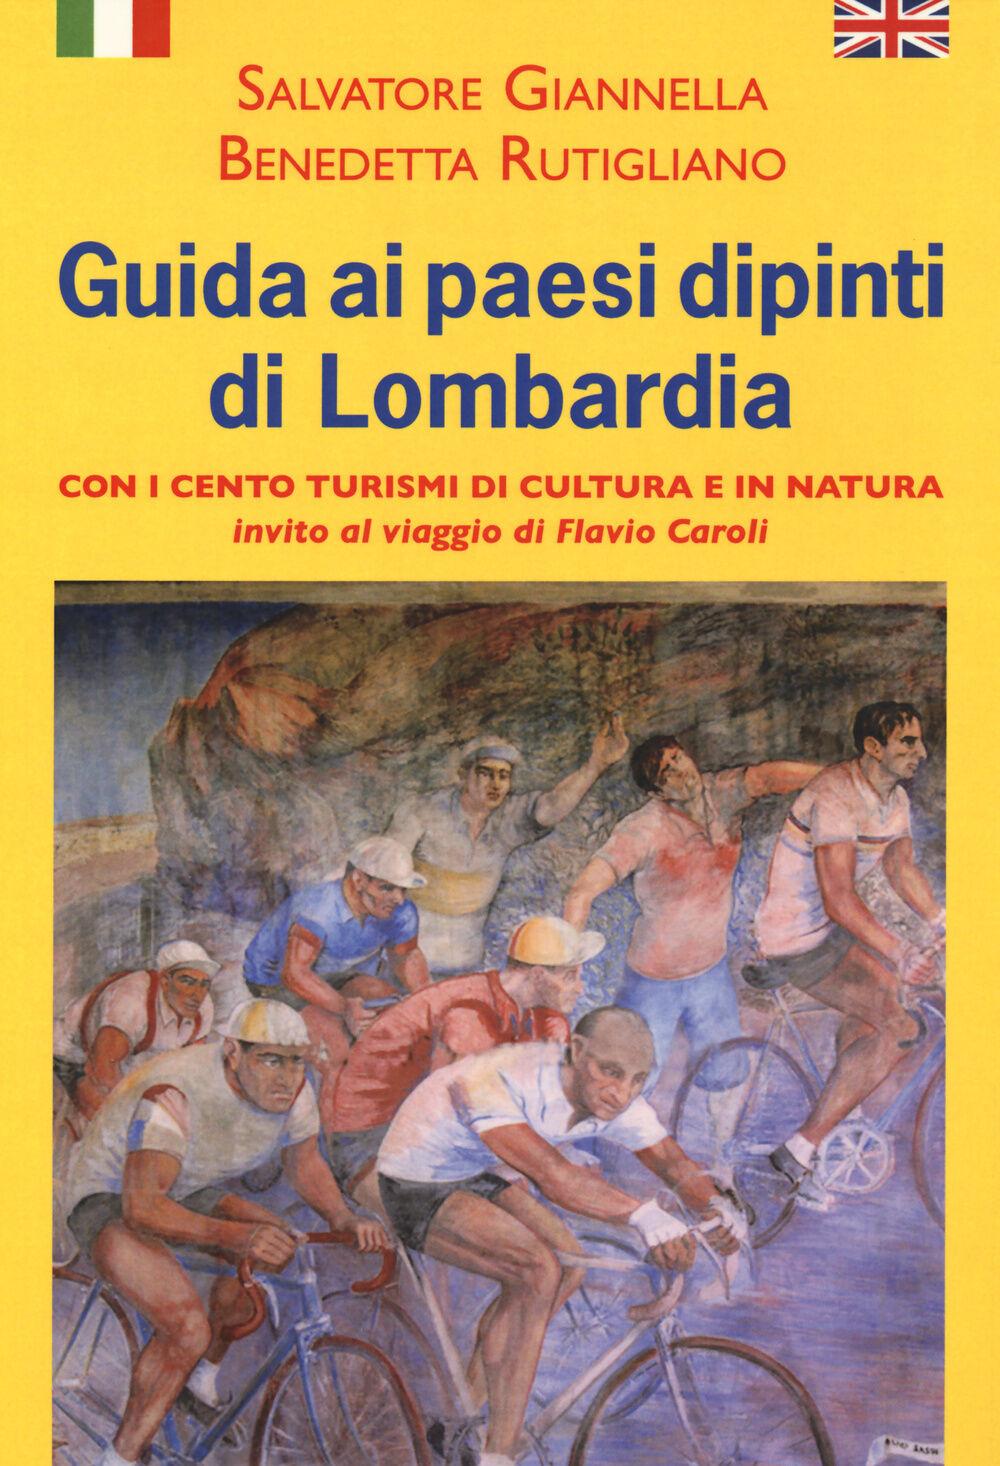 Guida ai paesi dipinti di Lombardia. Ediz. italiana e inglese